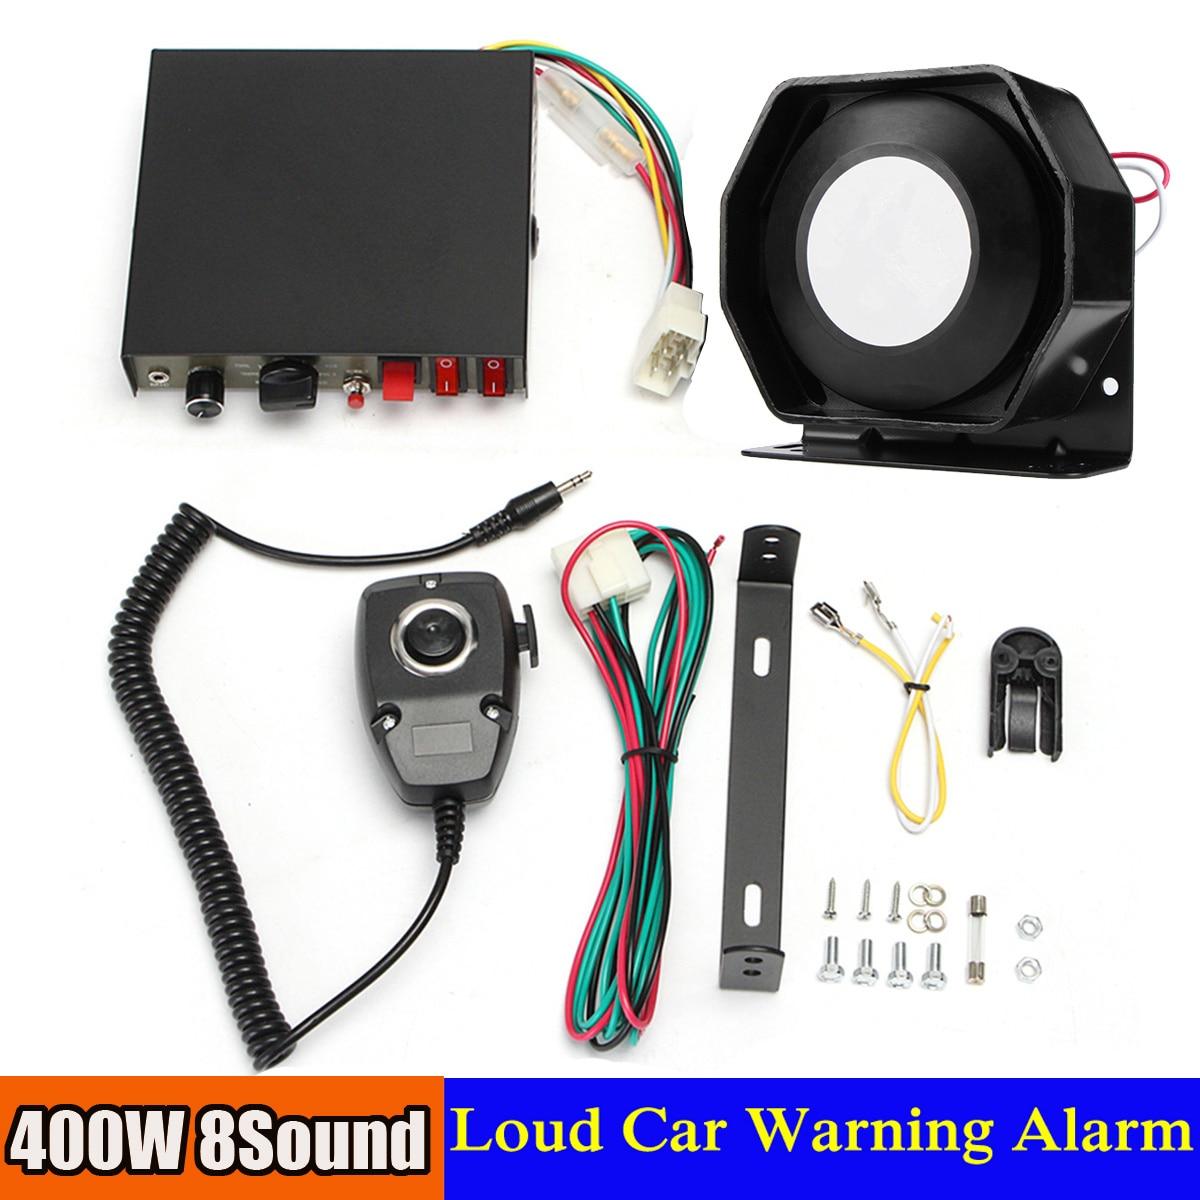 400W 8 Sound Loud Car Warning Alarm P olice Fire S iren Horn PA Speaker MIC System fire granny 2018 11 20t20 00